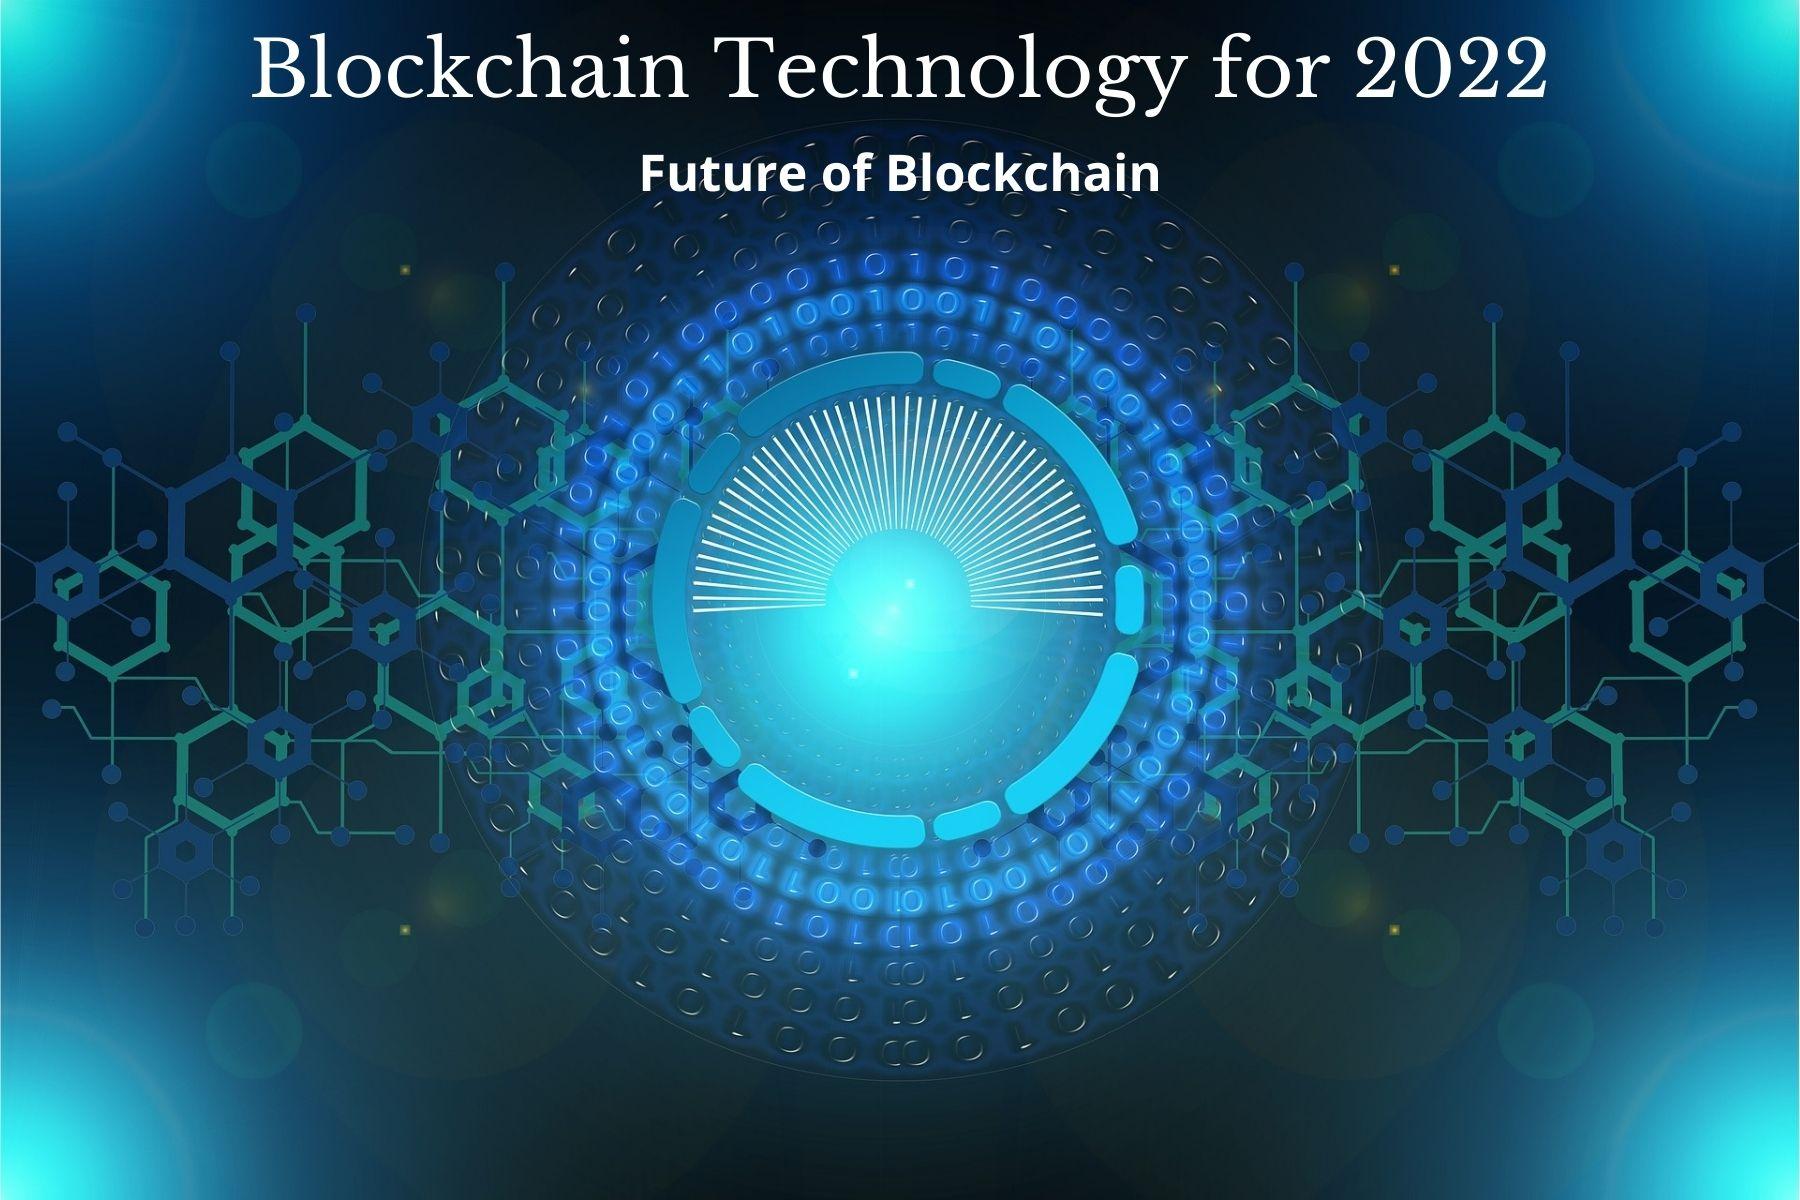 Blockchain Technology for 2022